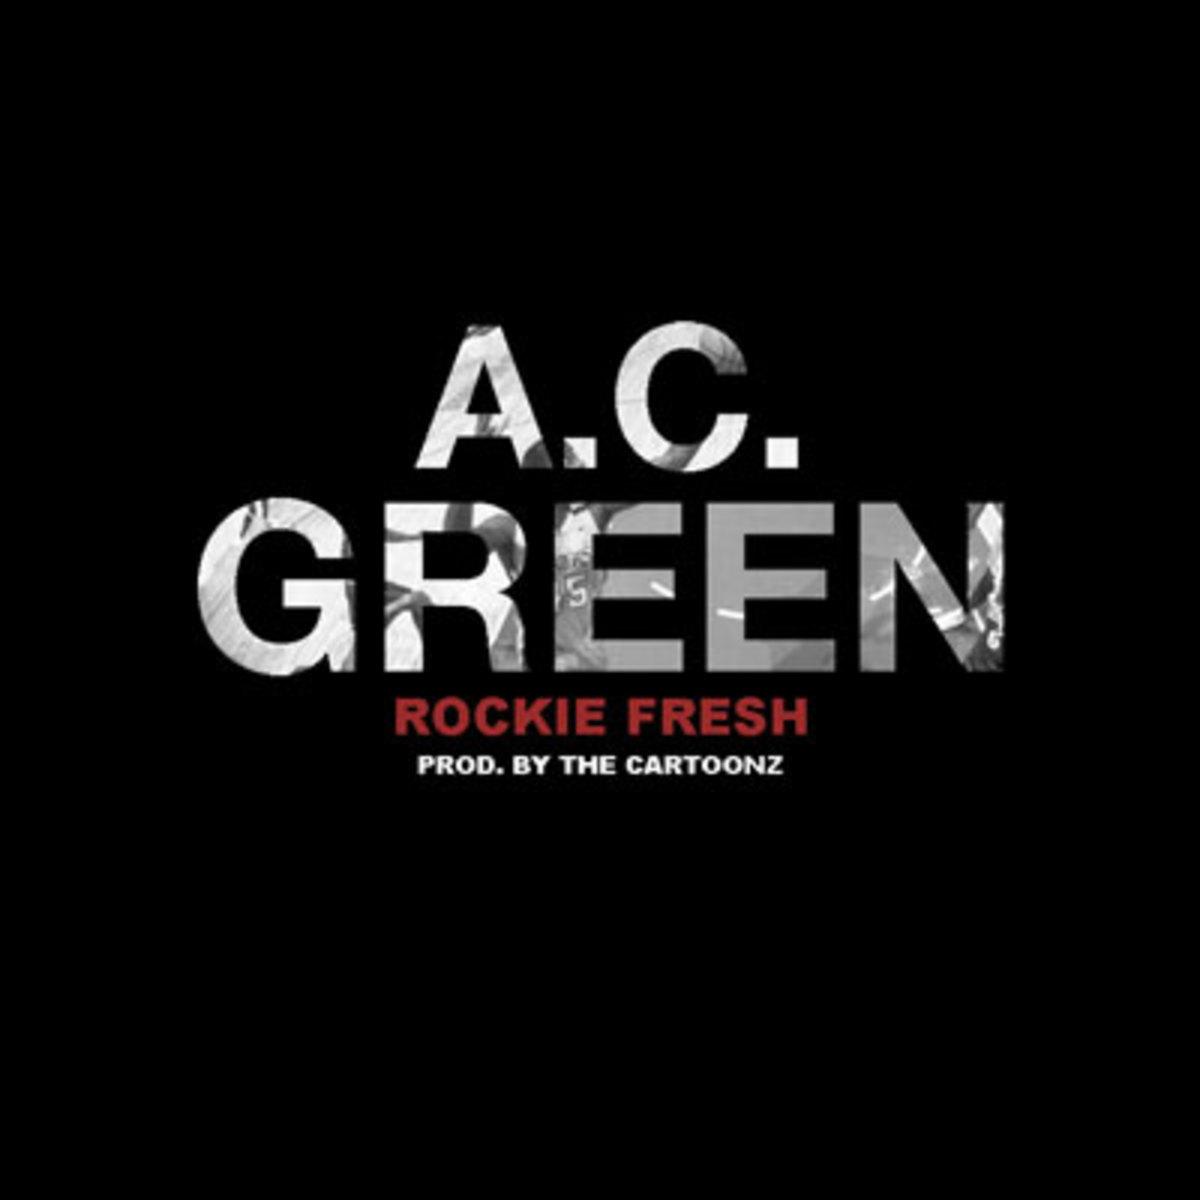 rockiefresh-acgreen.jpg